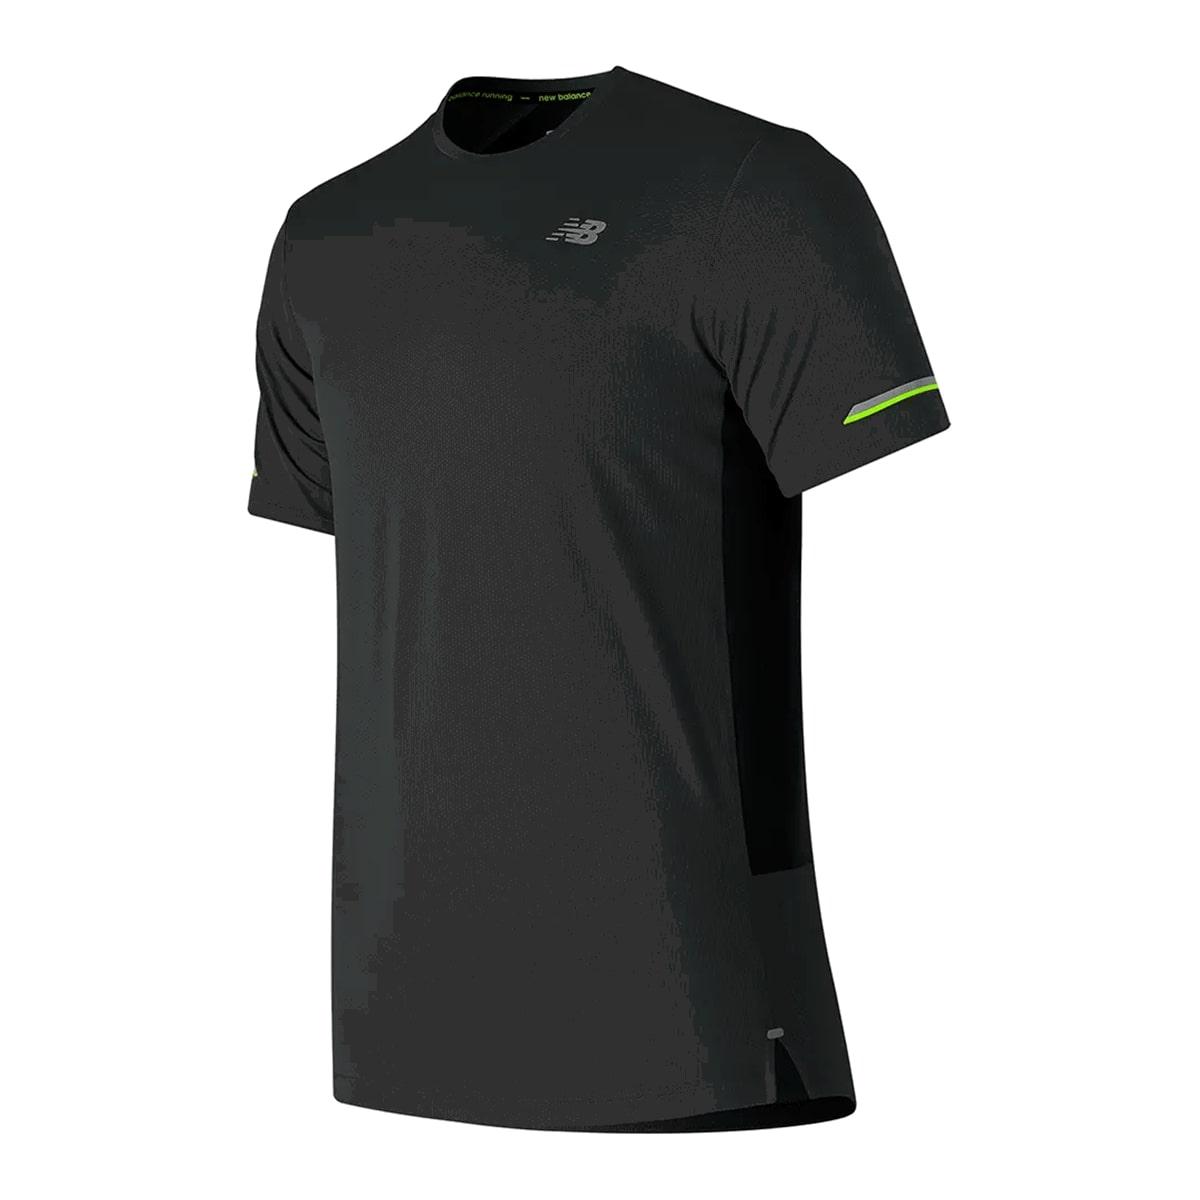 Camiseta New Balance 2.0 Ice Masculino Preto